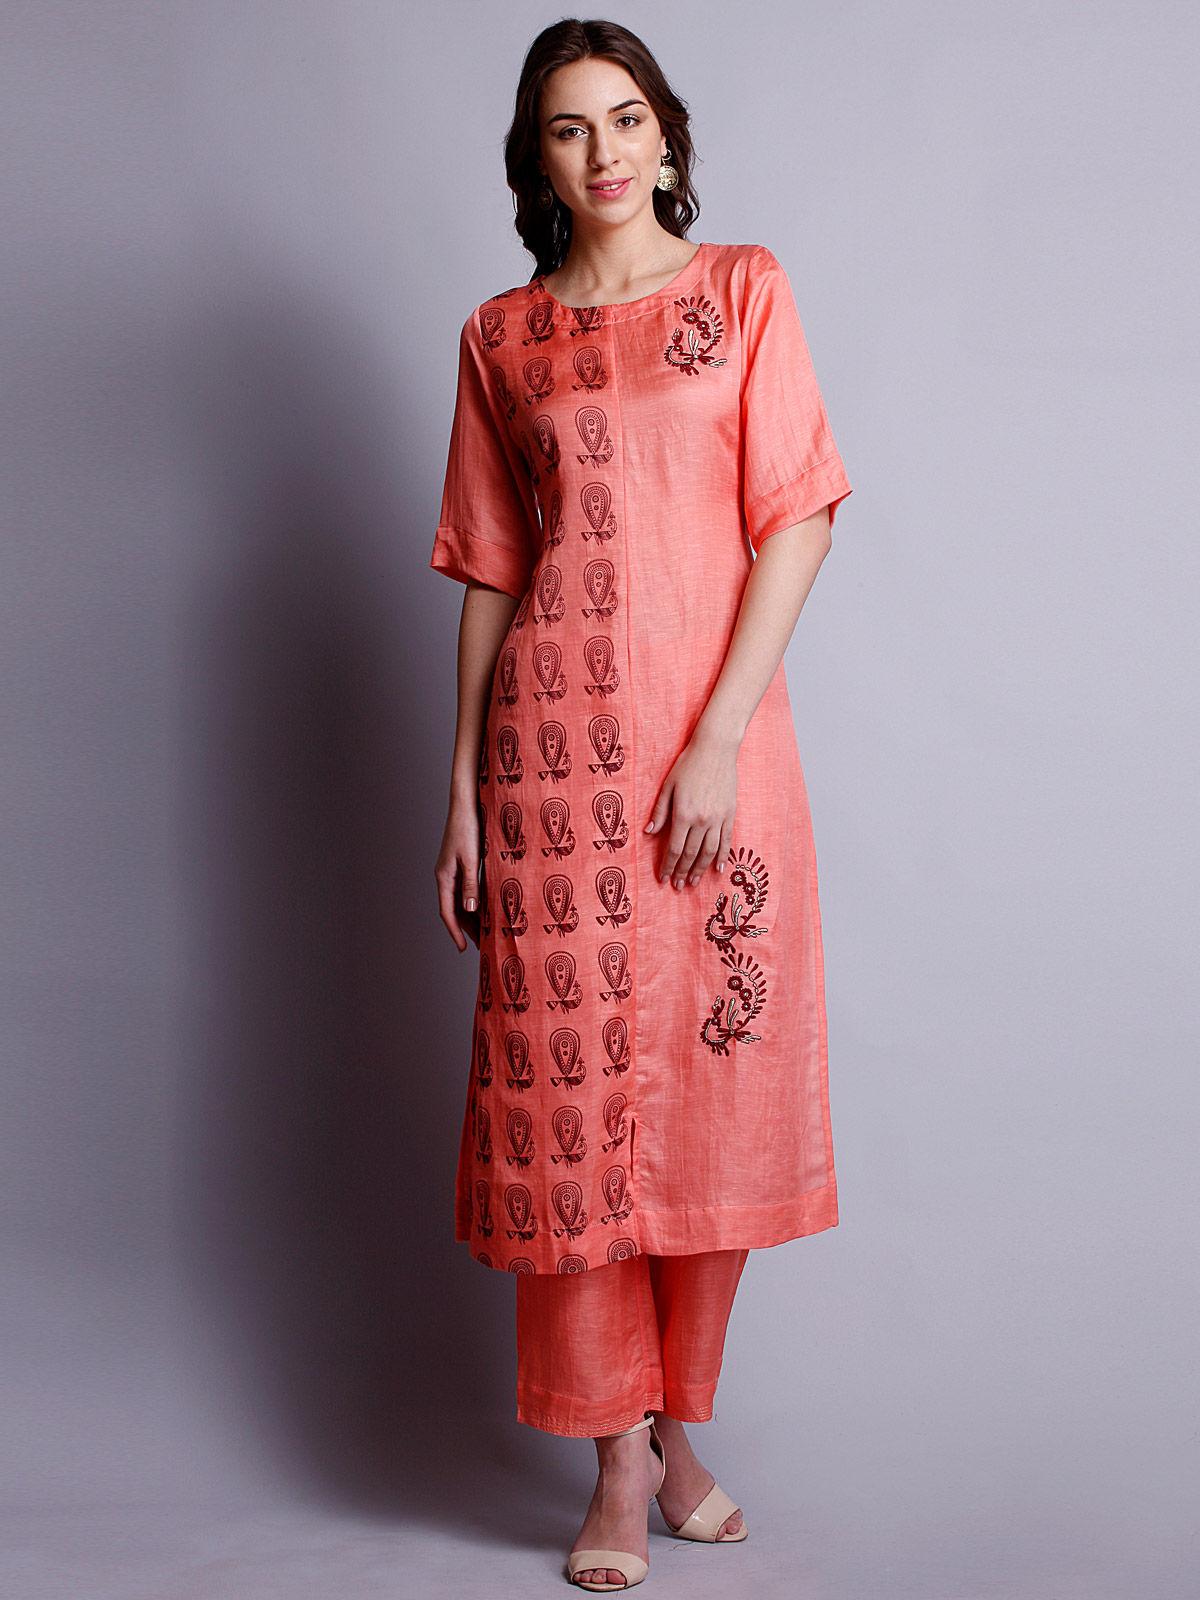 Peach Color embroidered Silk Linen Long kurta